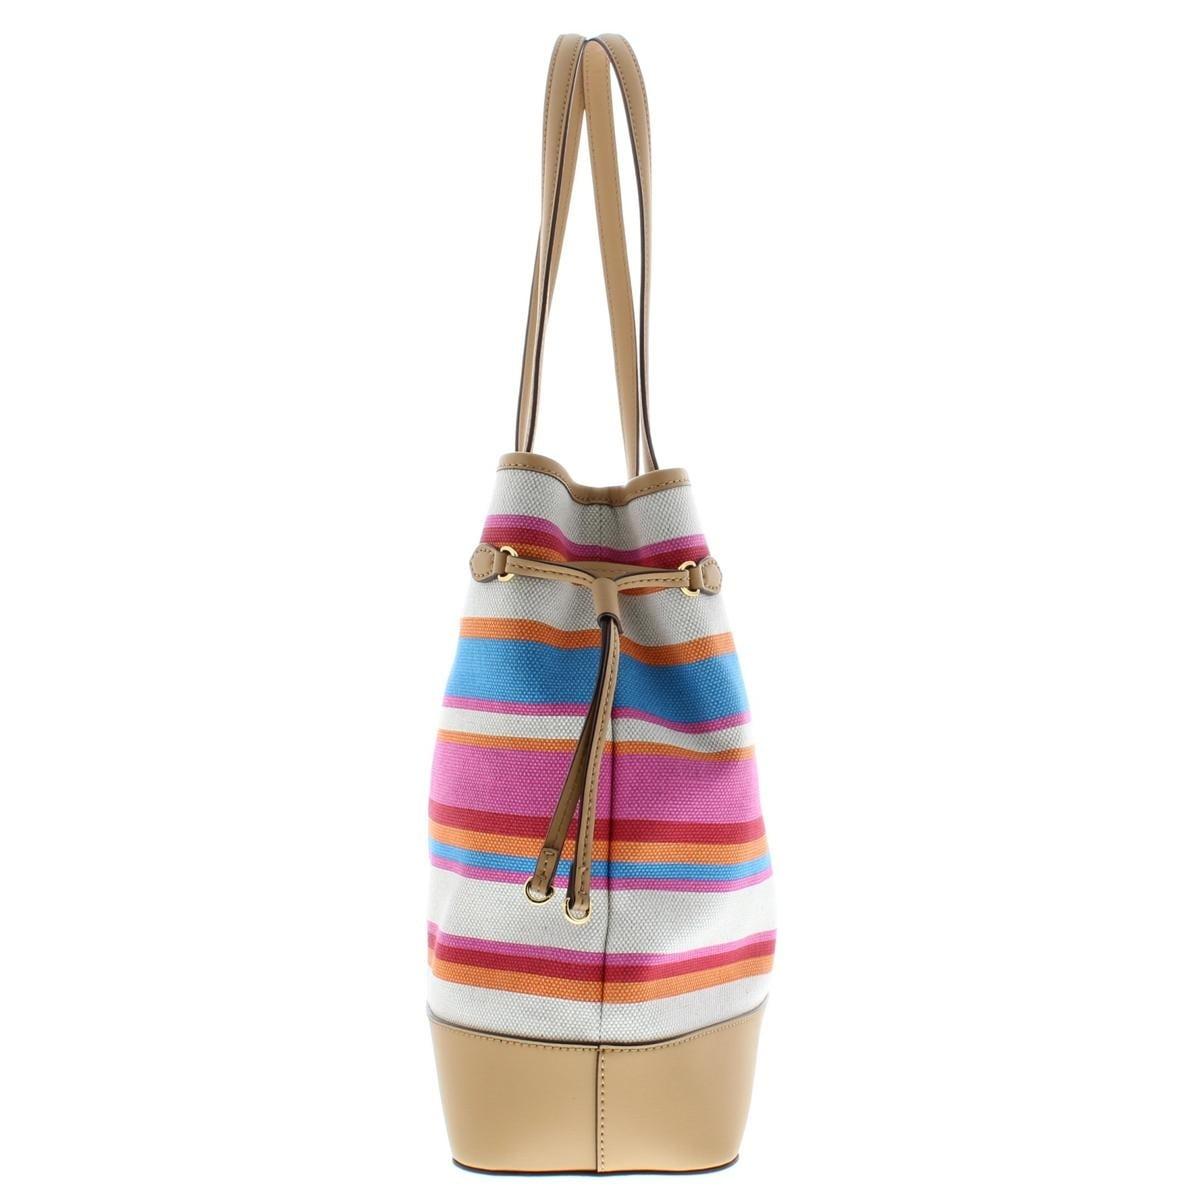 f982daf40 Shop Lauren Ralph Lauren Womens Piedmont Adalyn Tote Handbag Striped Canvas  - Large - Free Shipping On Orders Over $45 - Overstock - 22695662